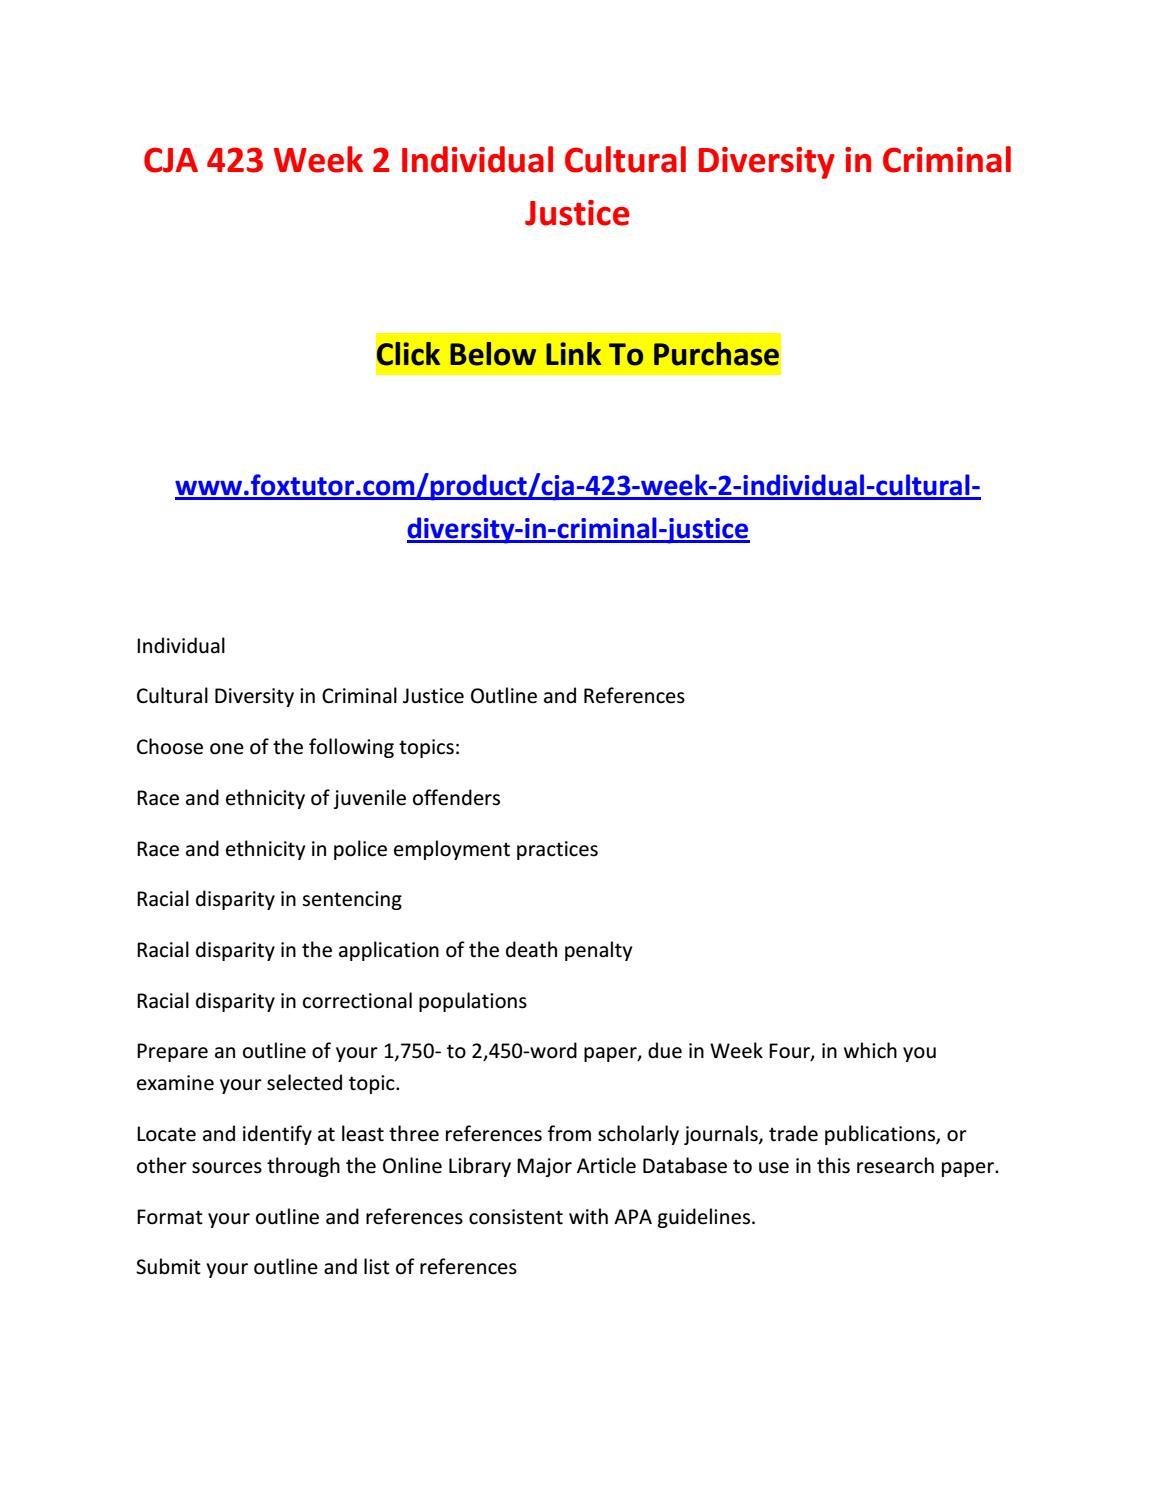 microfinance essay